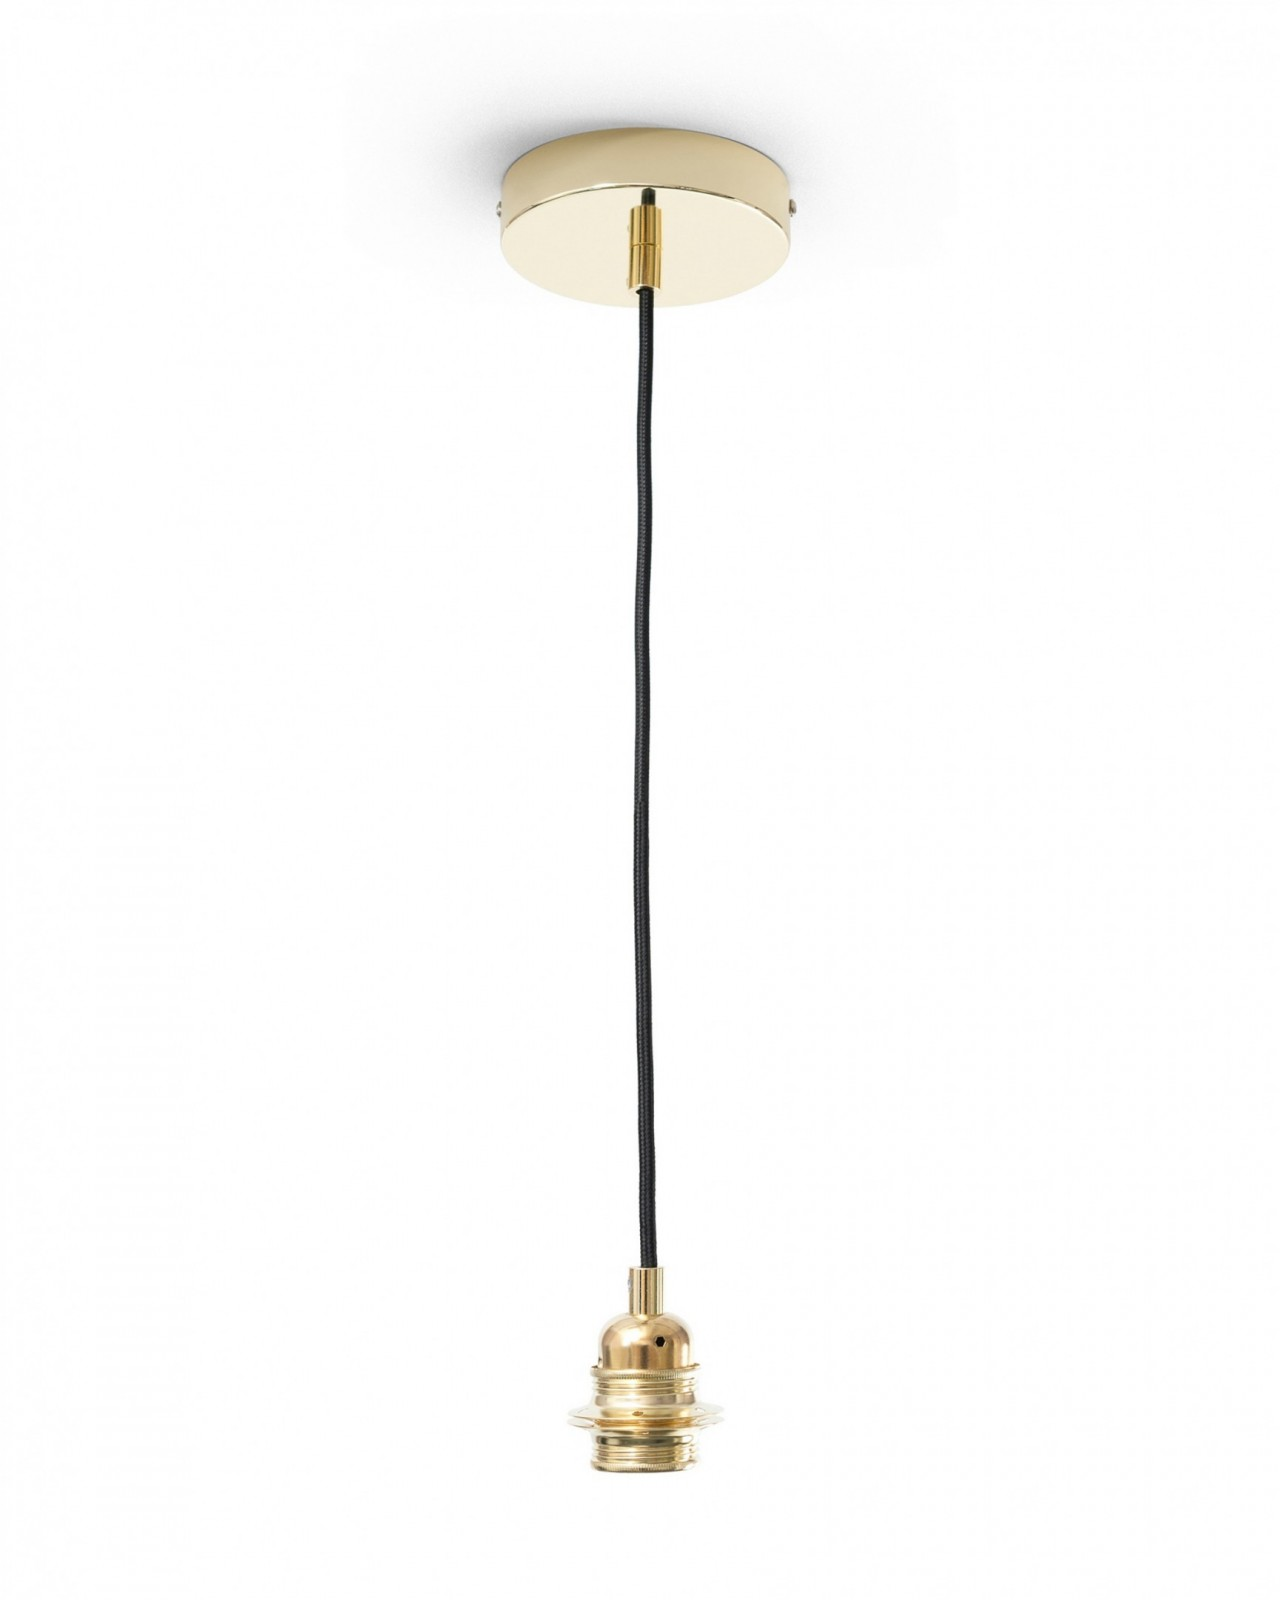 SAIGON Pendant Lamp